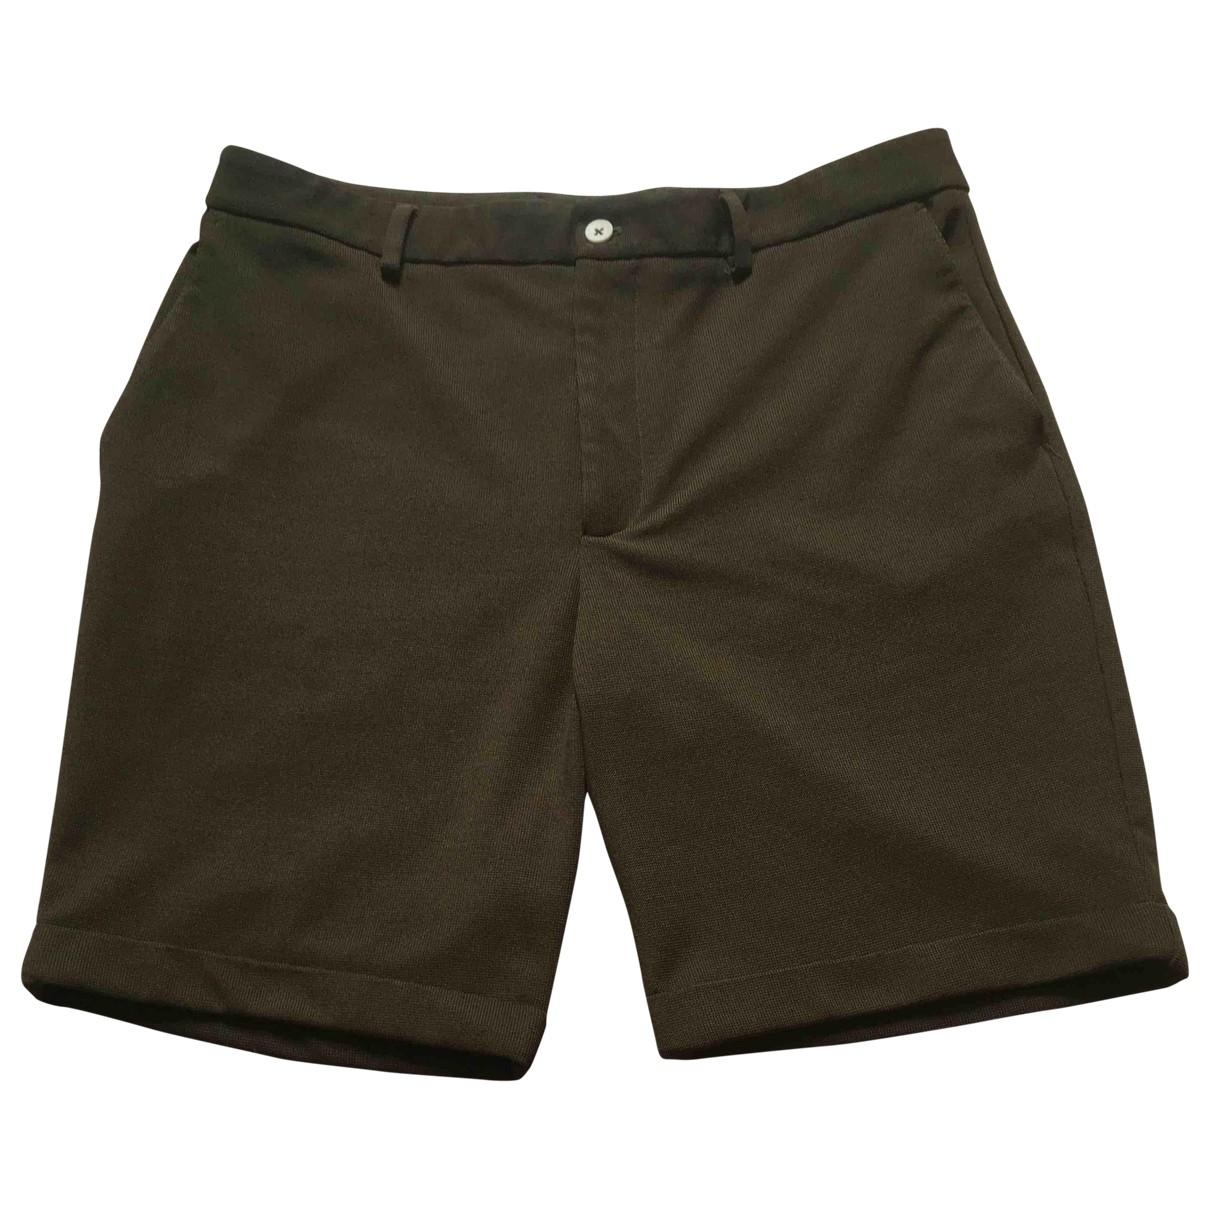 Zara \N Green Shorts for Men 32 UK - US